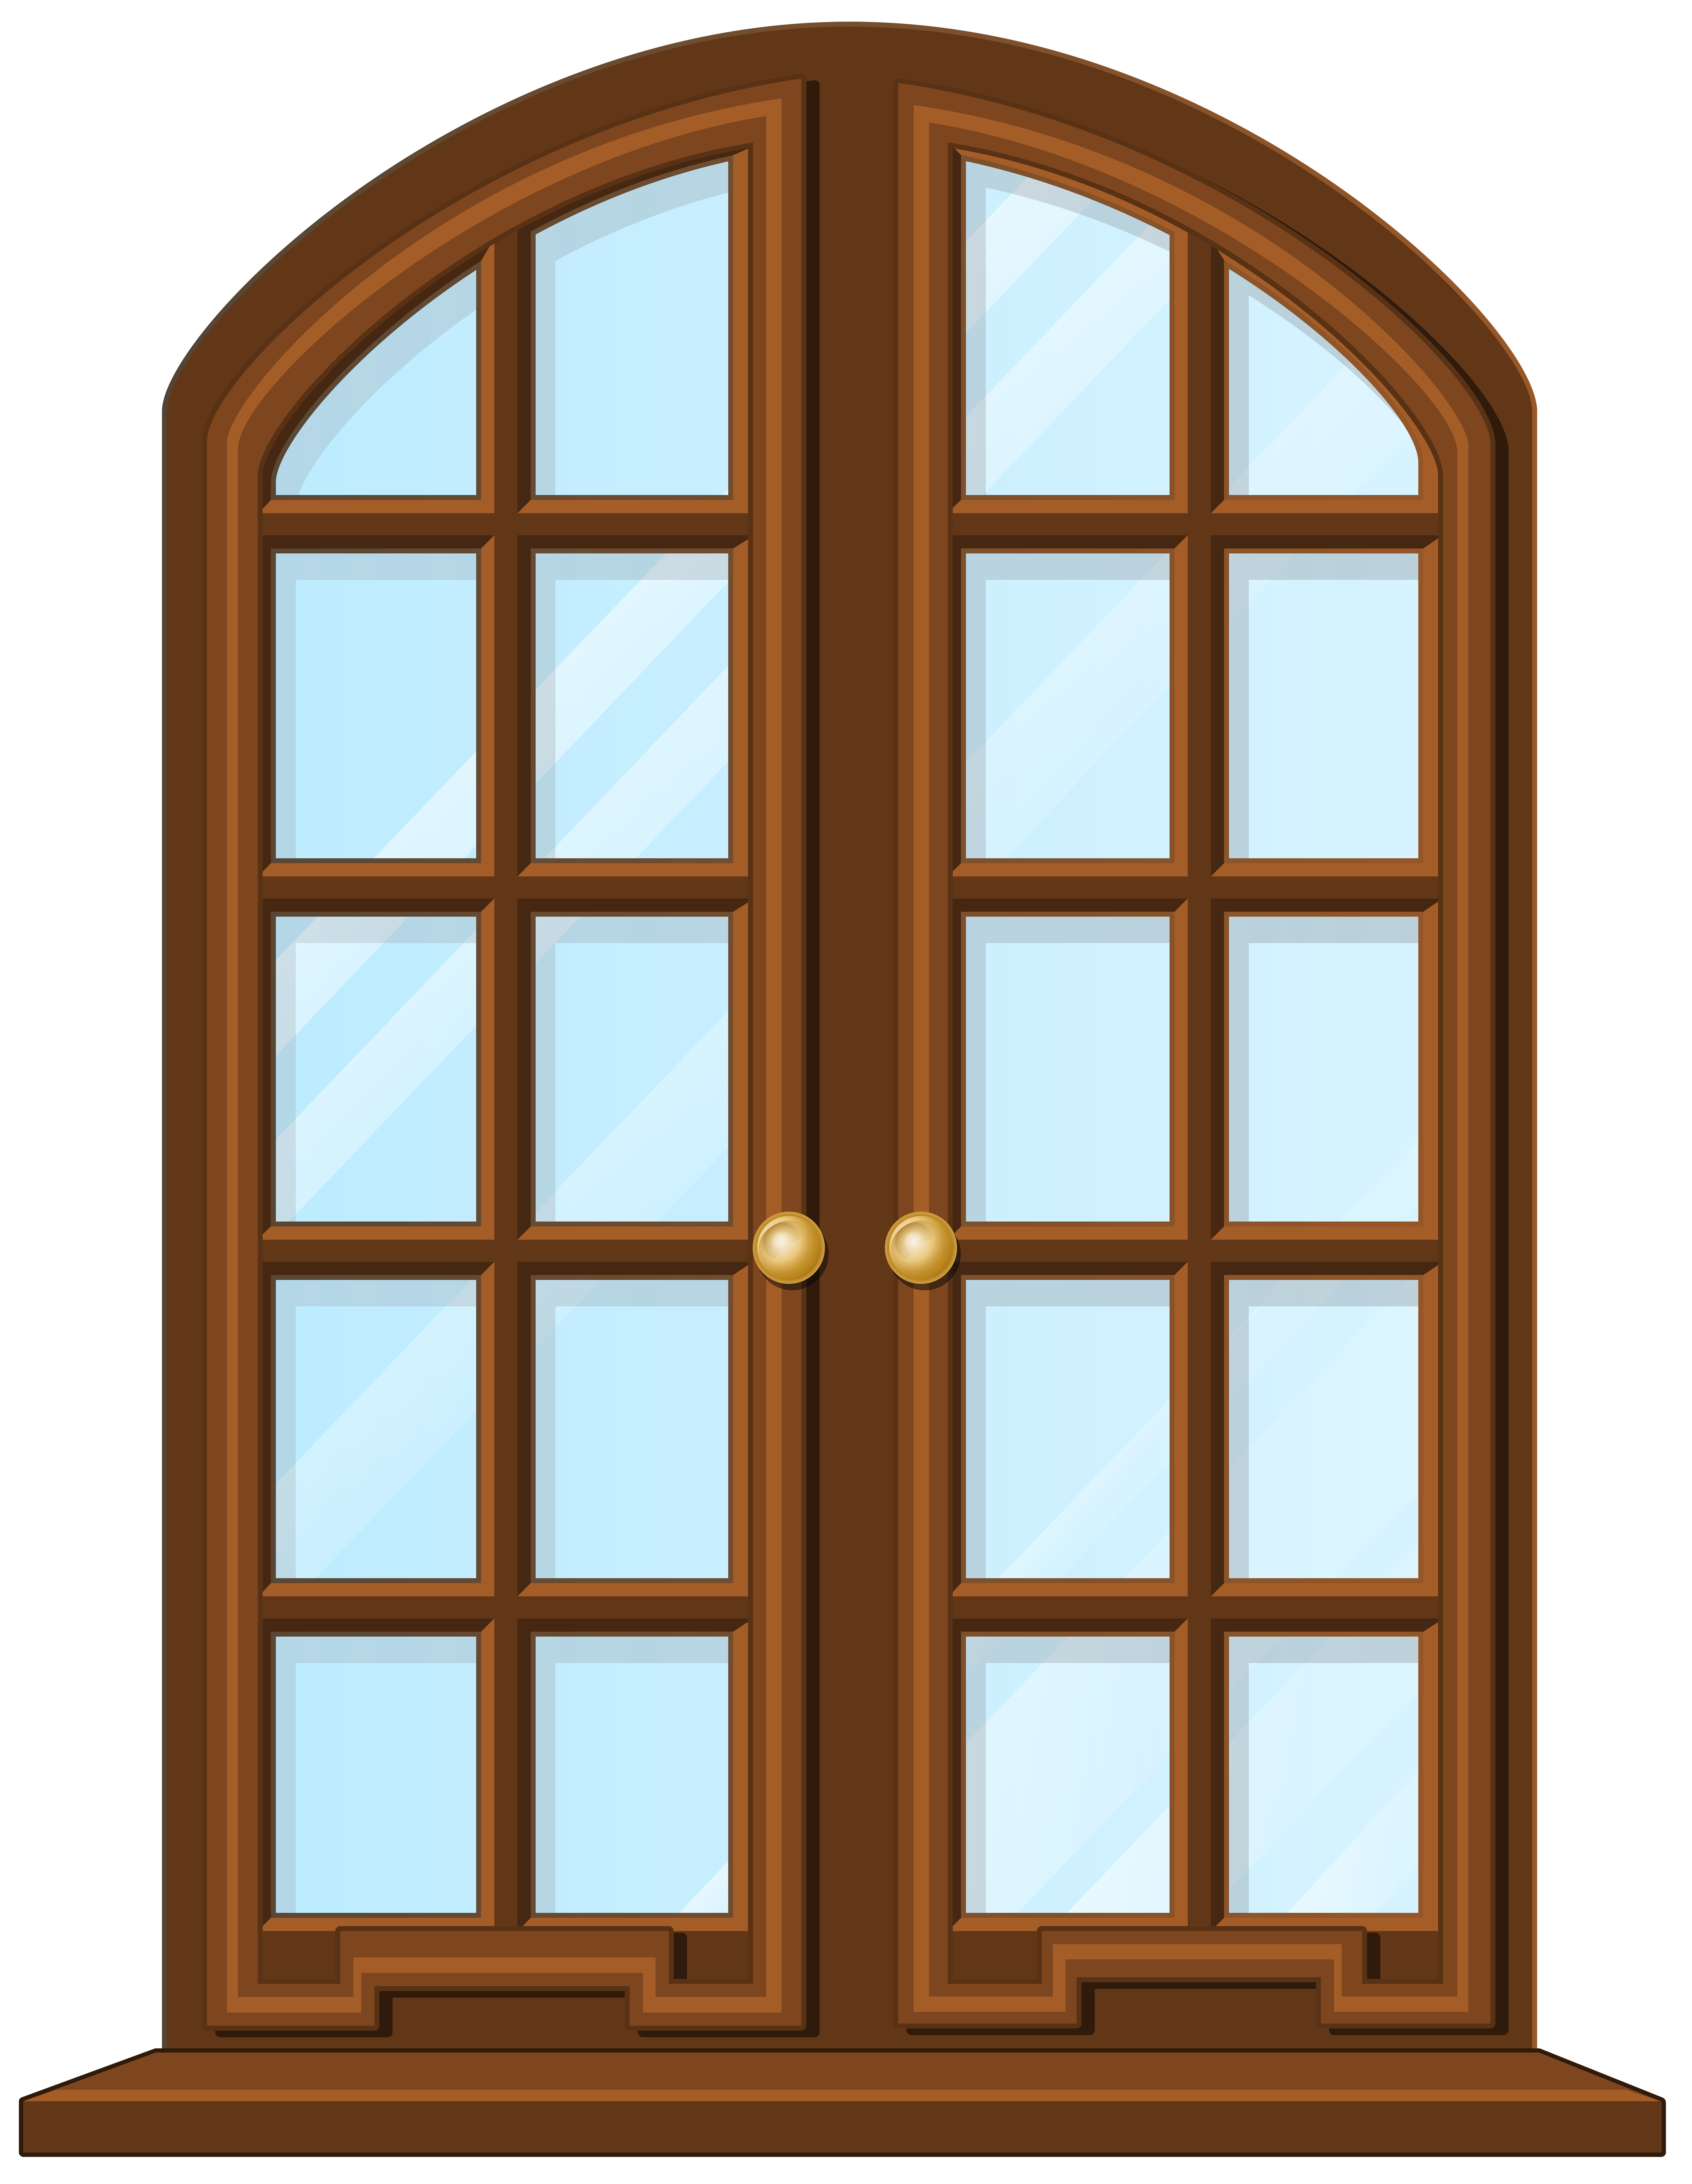 Window clipart arched window Arch Brown Window Clip Window